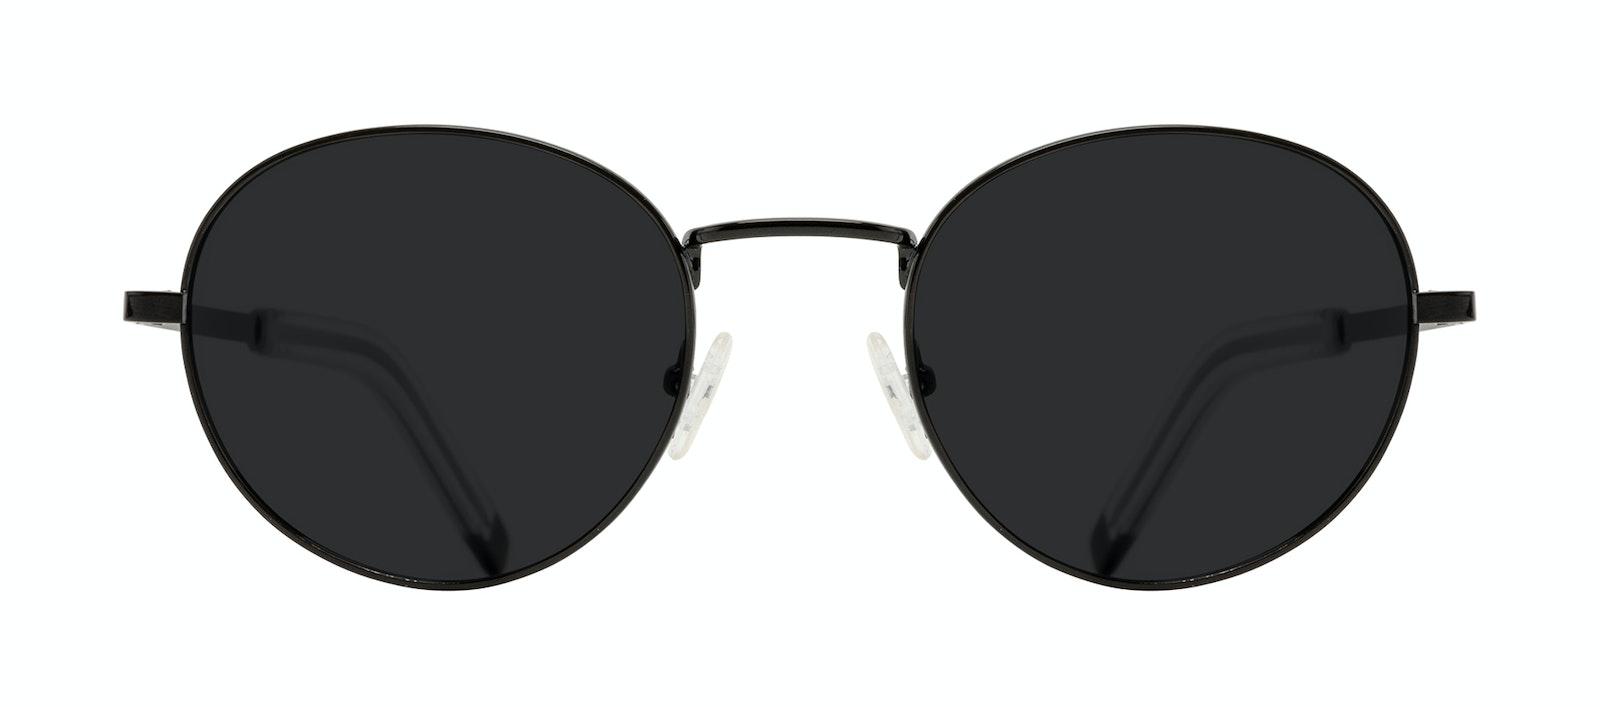 Affordable Fashion Glasses Round Sunglasses Men Lean L Black Front